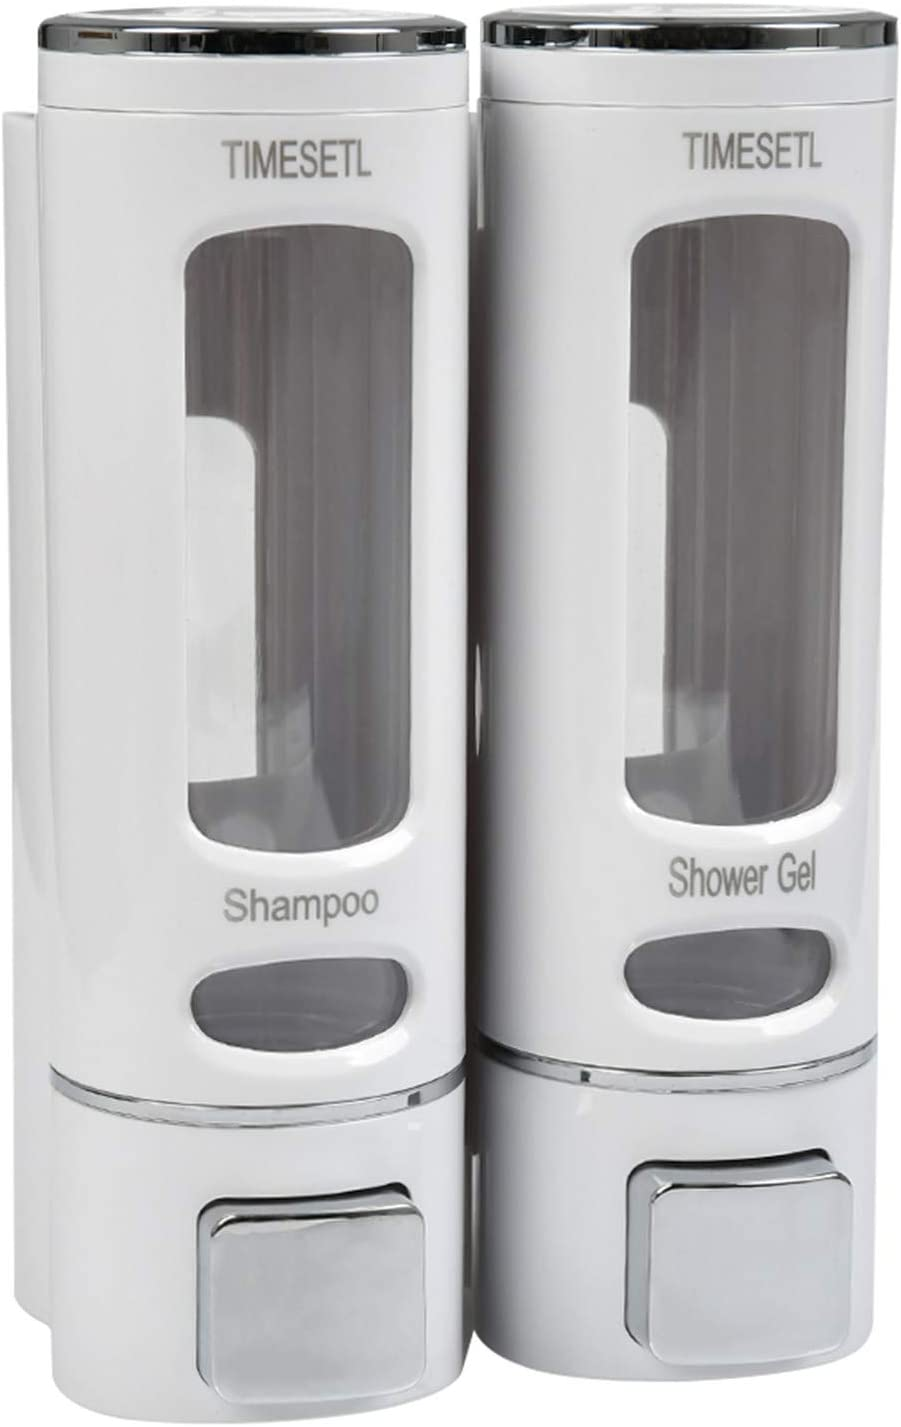 TIMESETL Dispensadores de jabón, 400ML x 2 Dispensador de desinfectante de champú Manual montado en la Pared para champú o Limpiador de Manos, Blanco